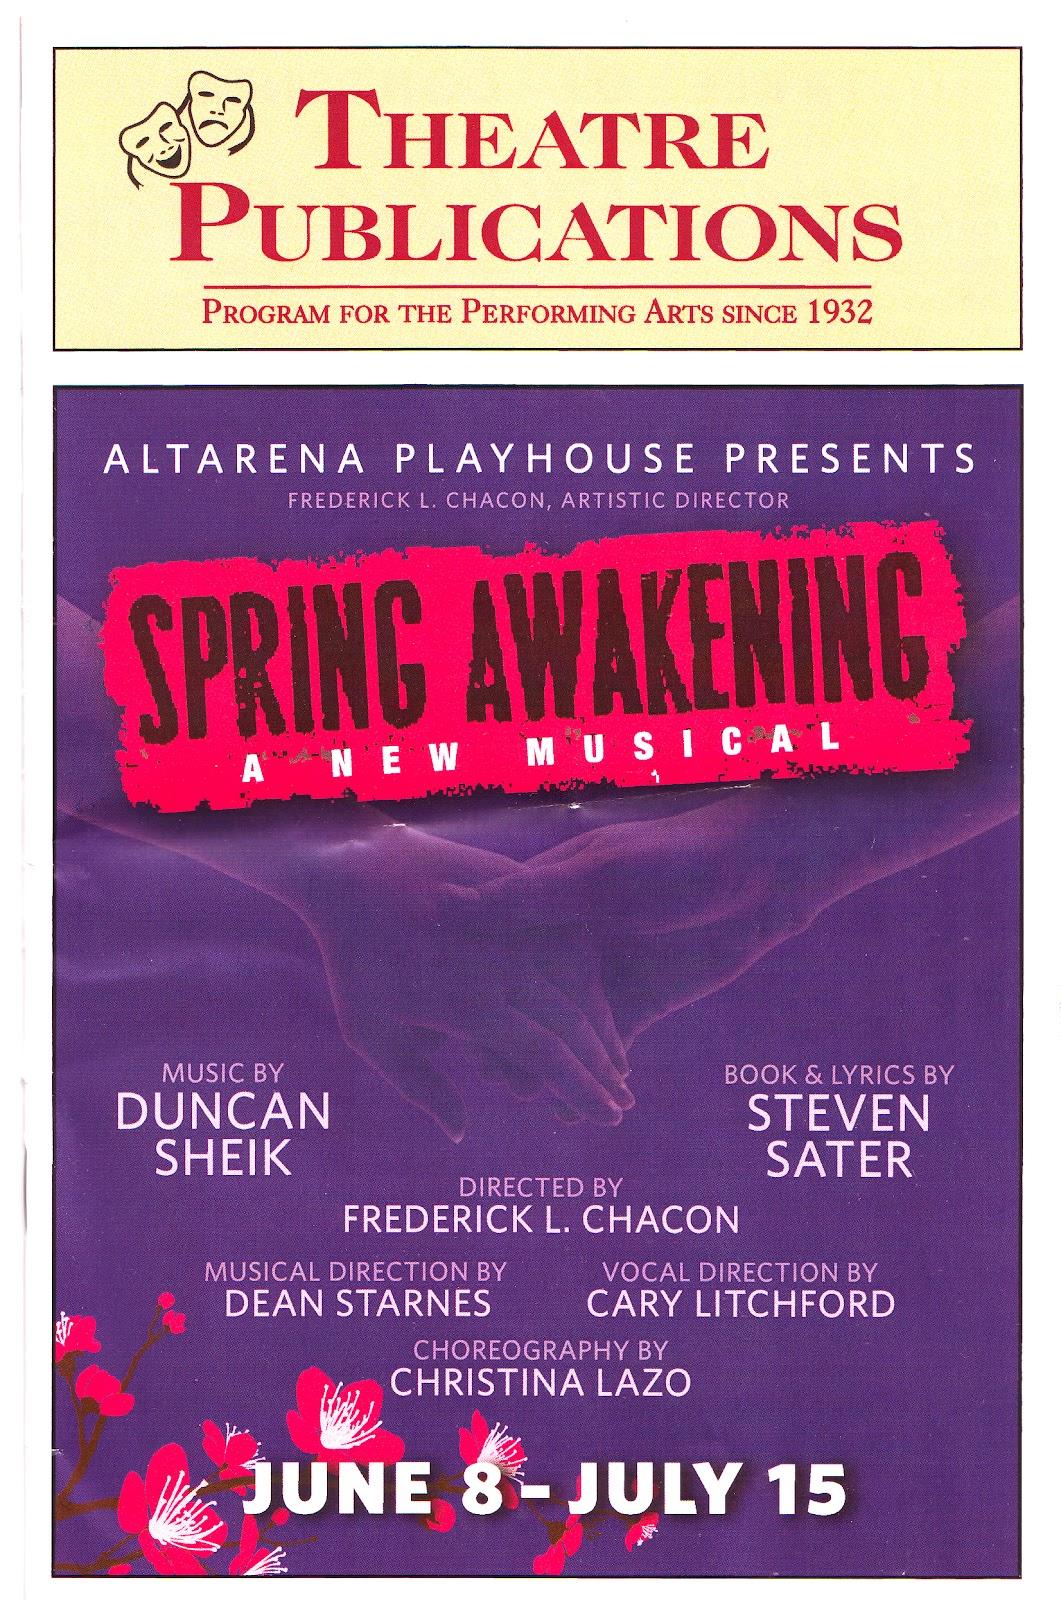 http://4.bp.blogspot.com/-ju4LipTBJIg/T_xXrHwHvgI/AAAAAAAALOs/hgMwC9HN-f0/s1600/Altarena_Spring_Awakening.jpg